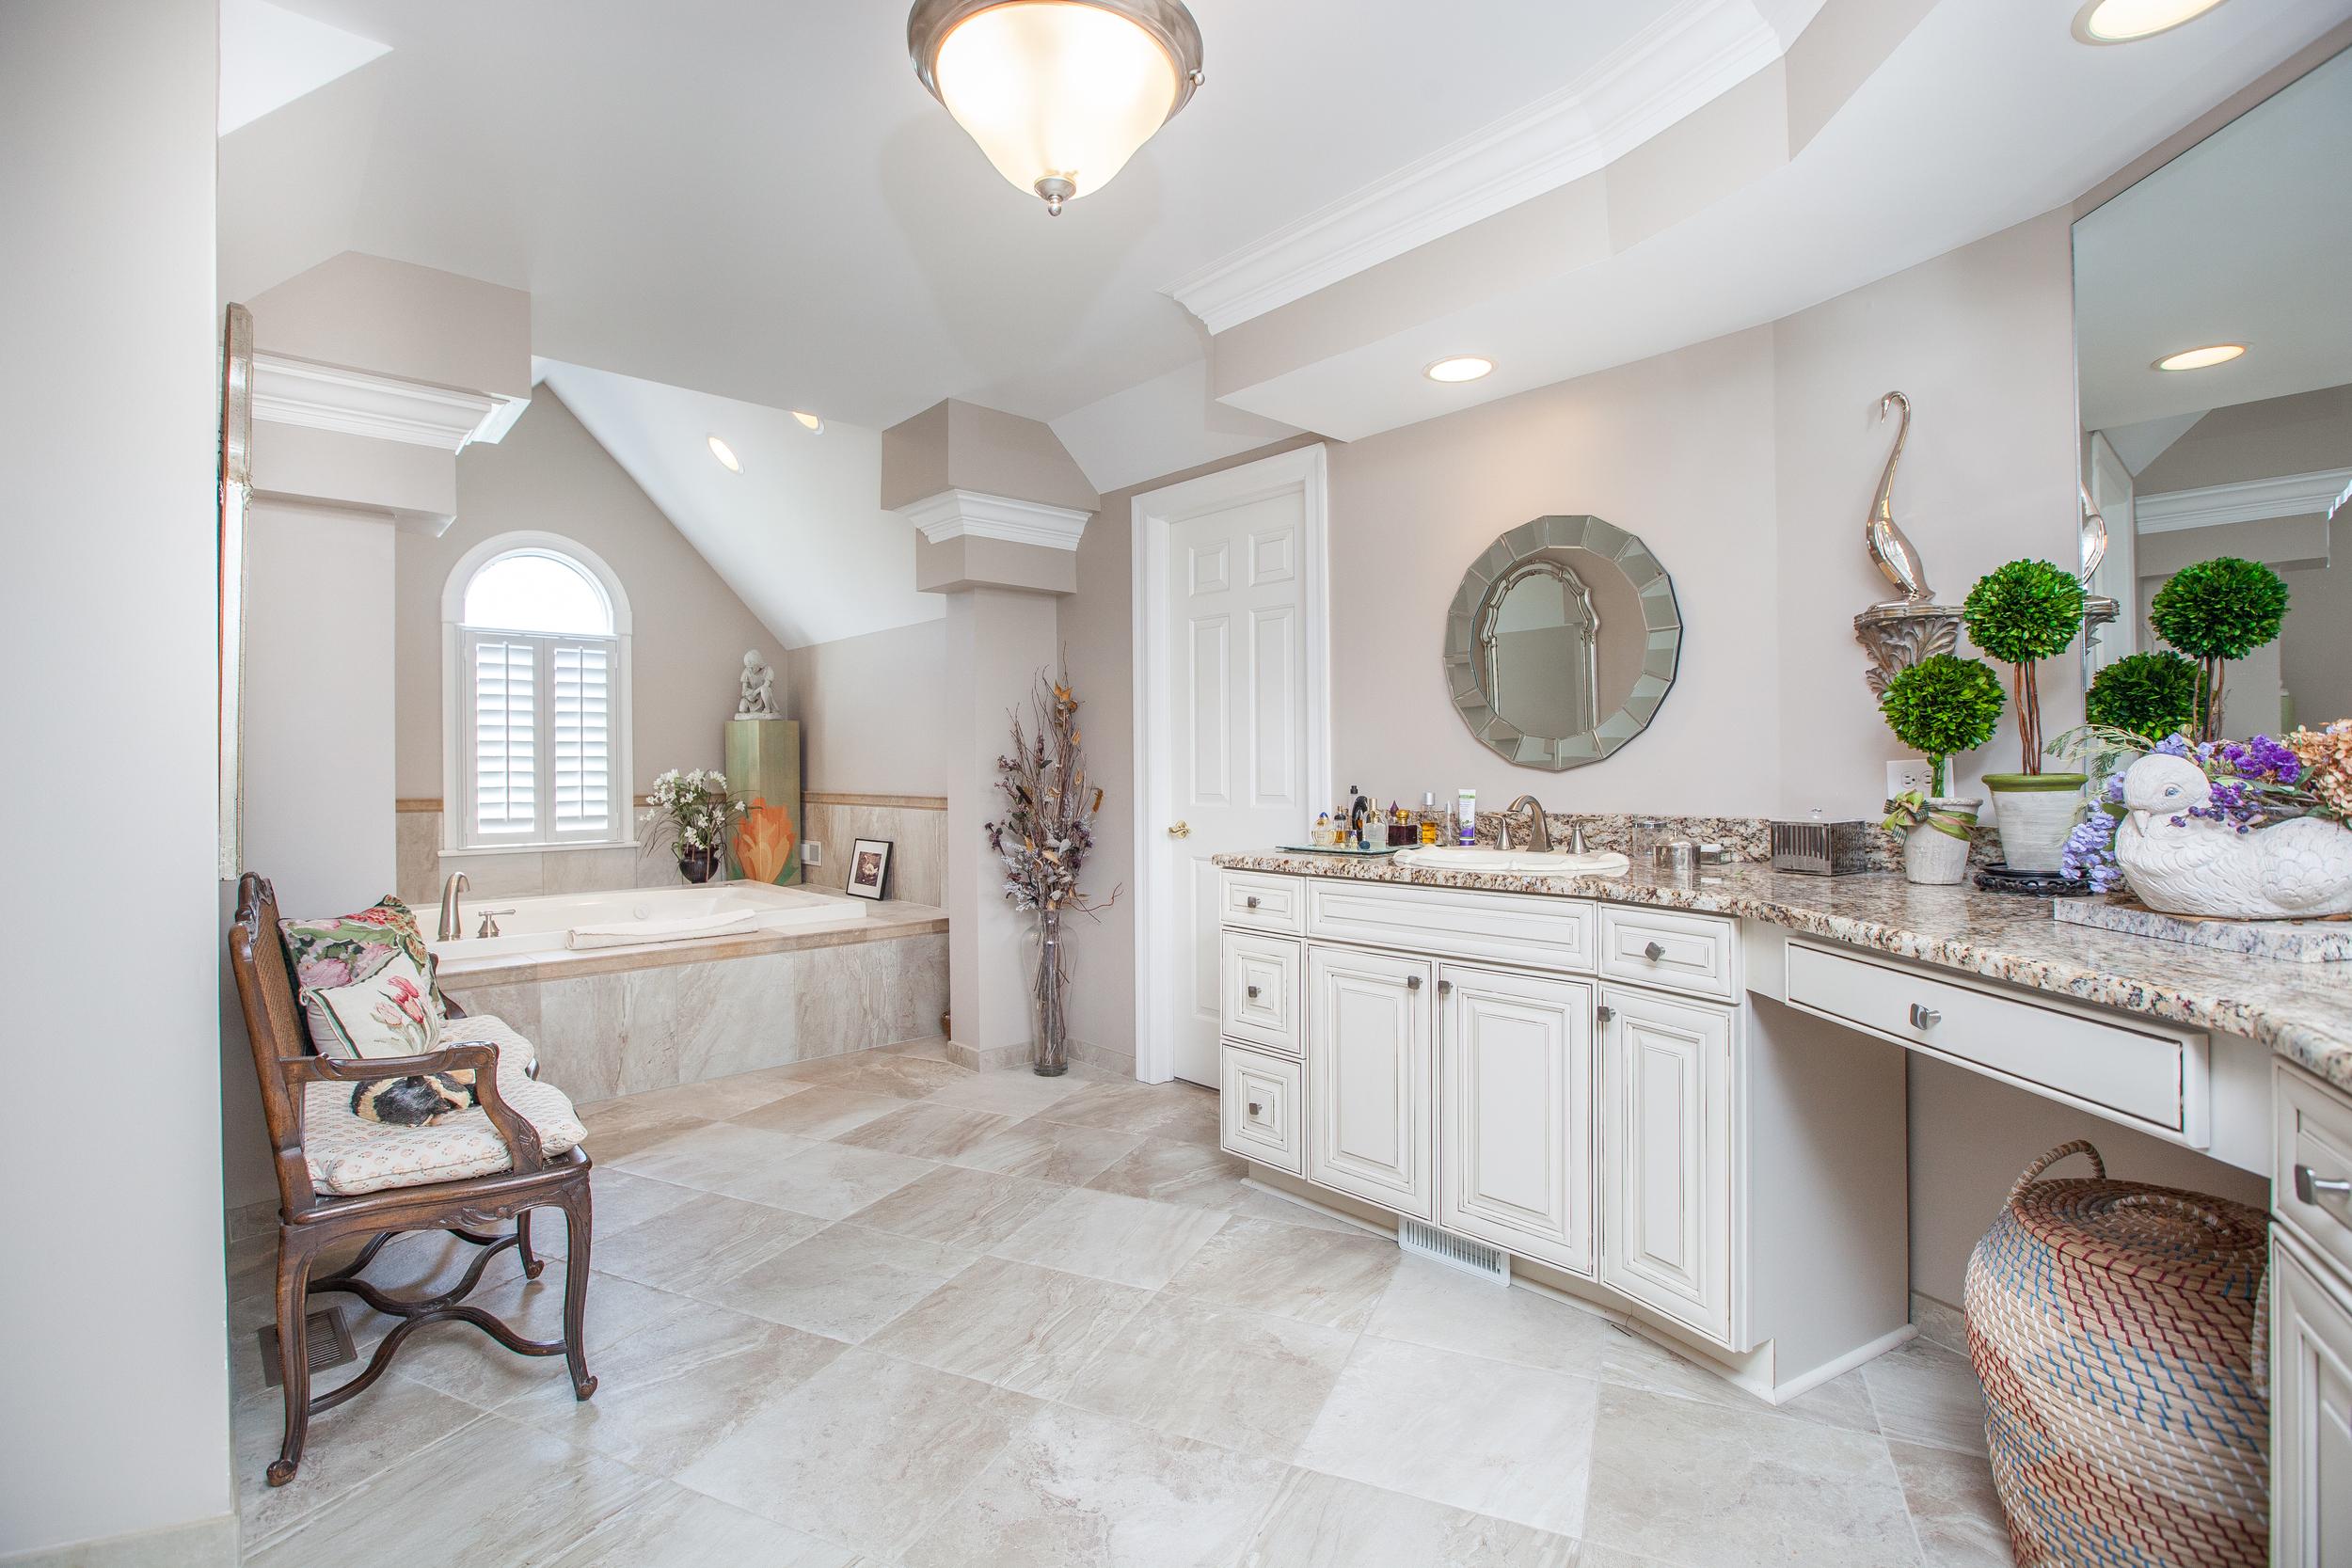 Master Bathroom Vanity and Tub.jpg